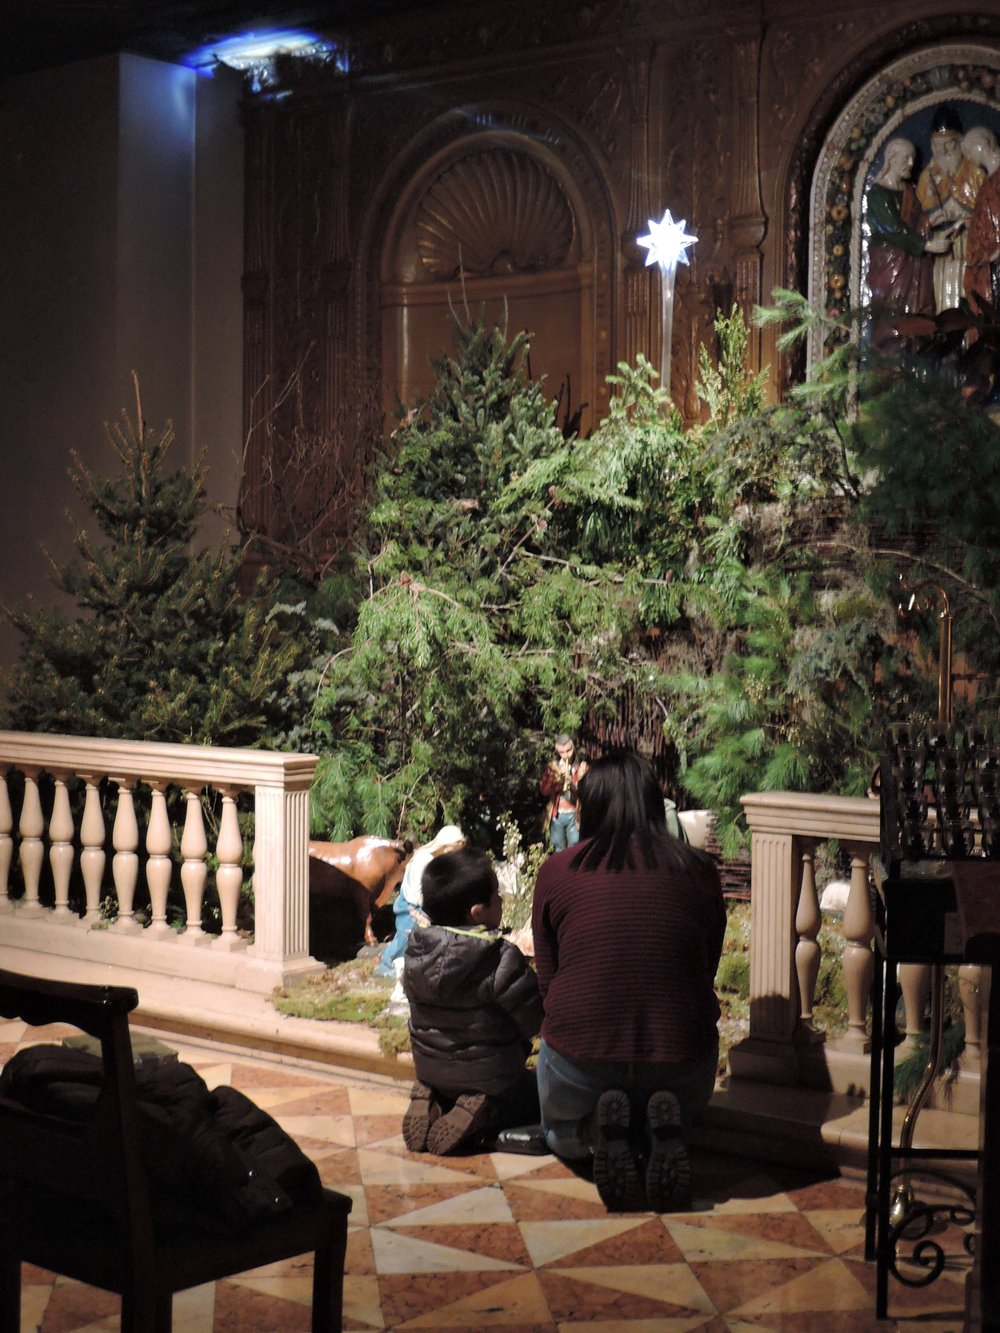 At the Creche after Mass